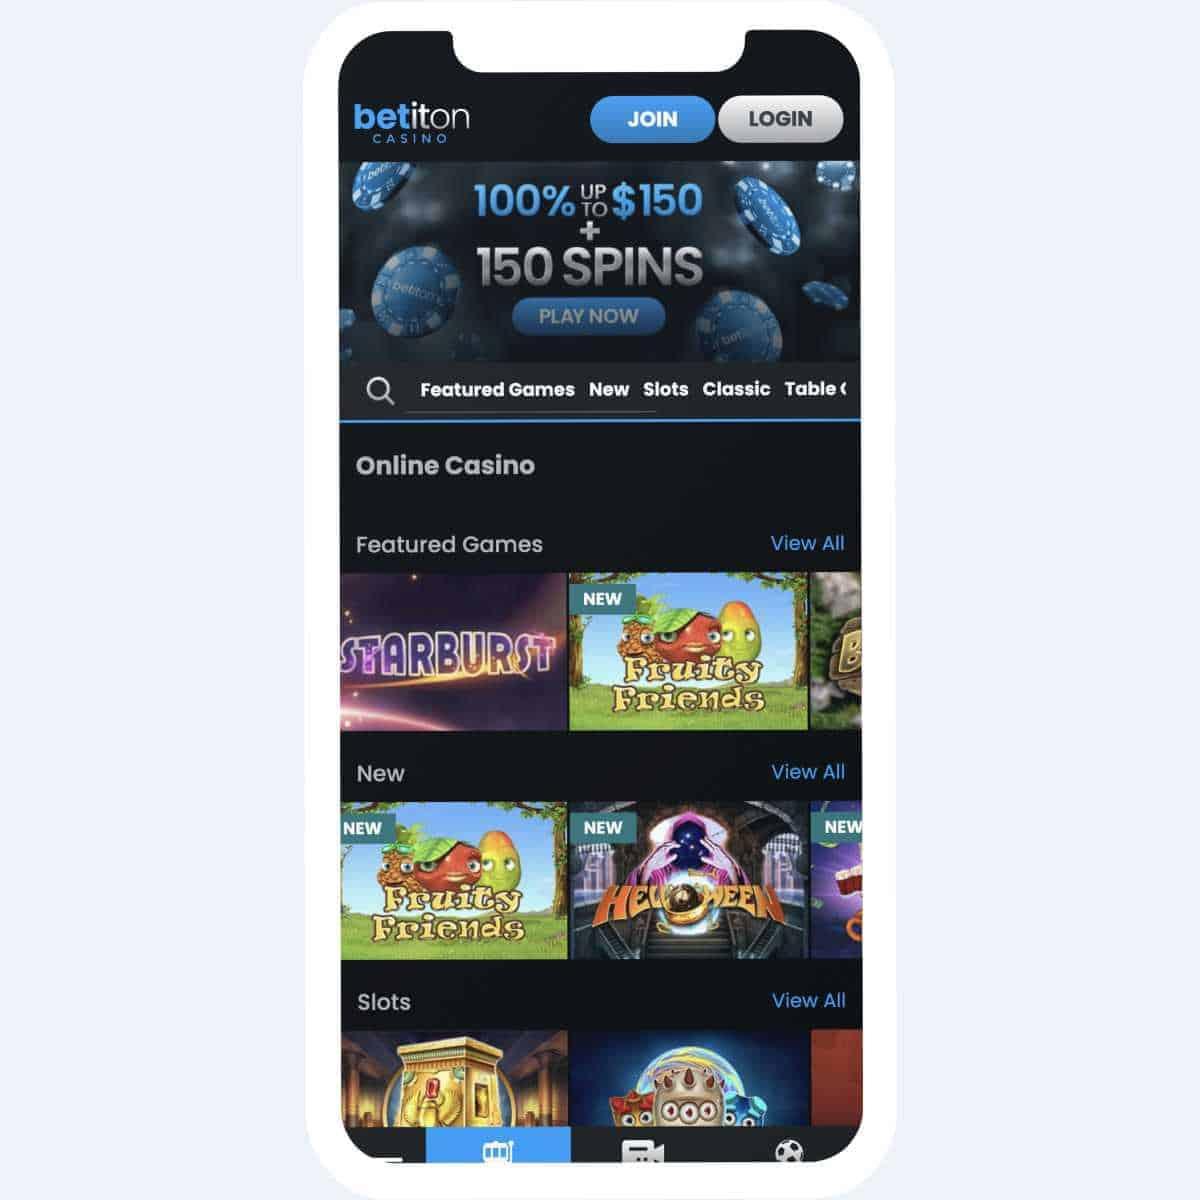 betiton homepage mobile